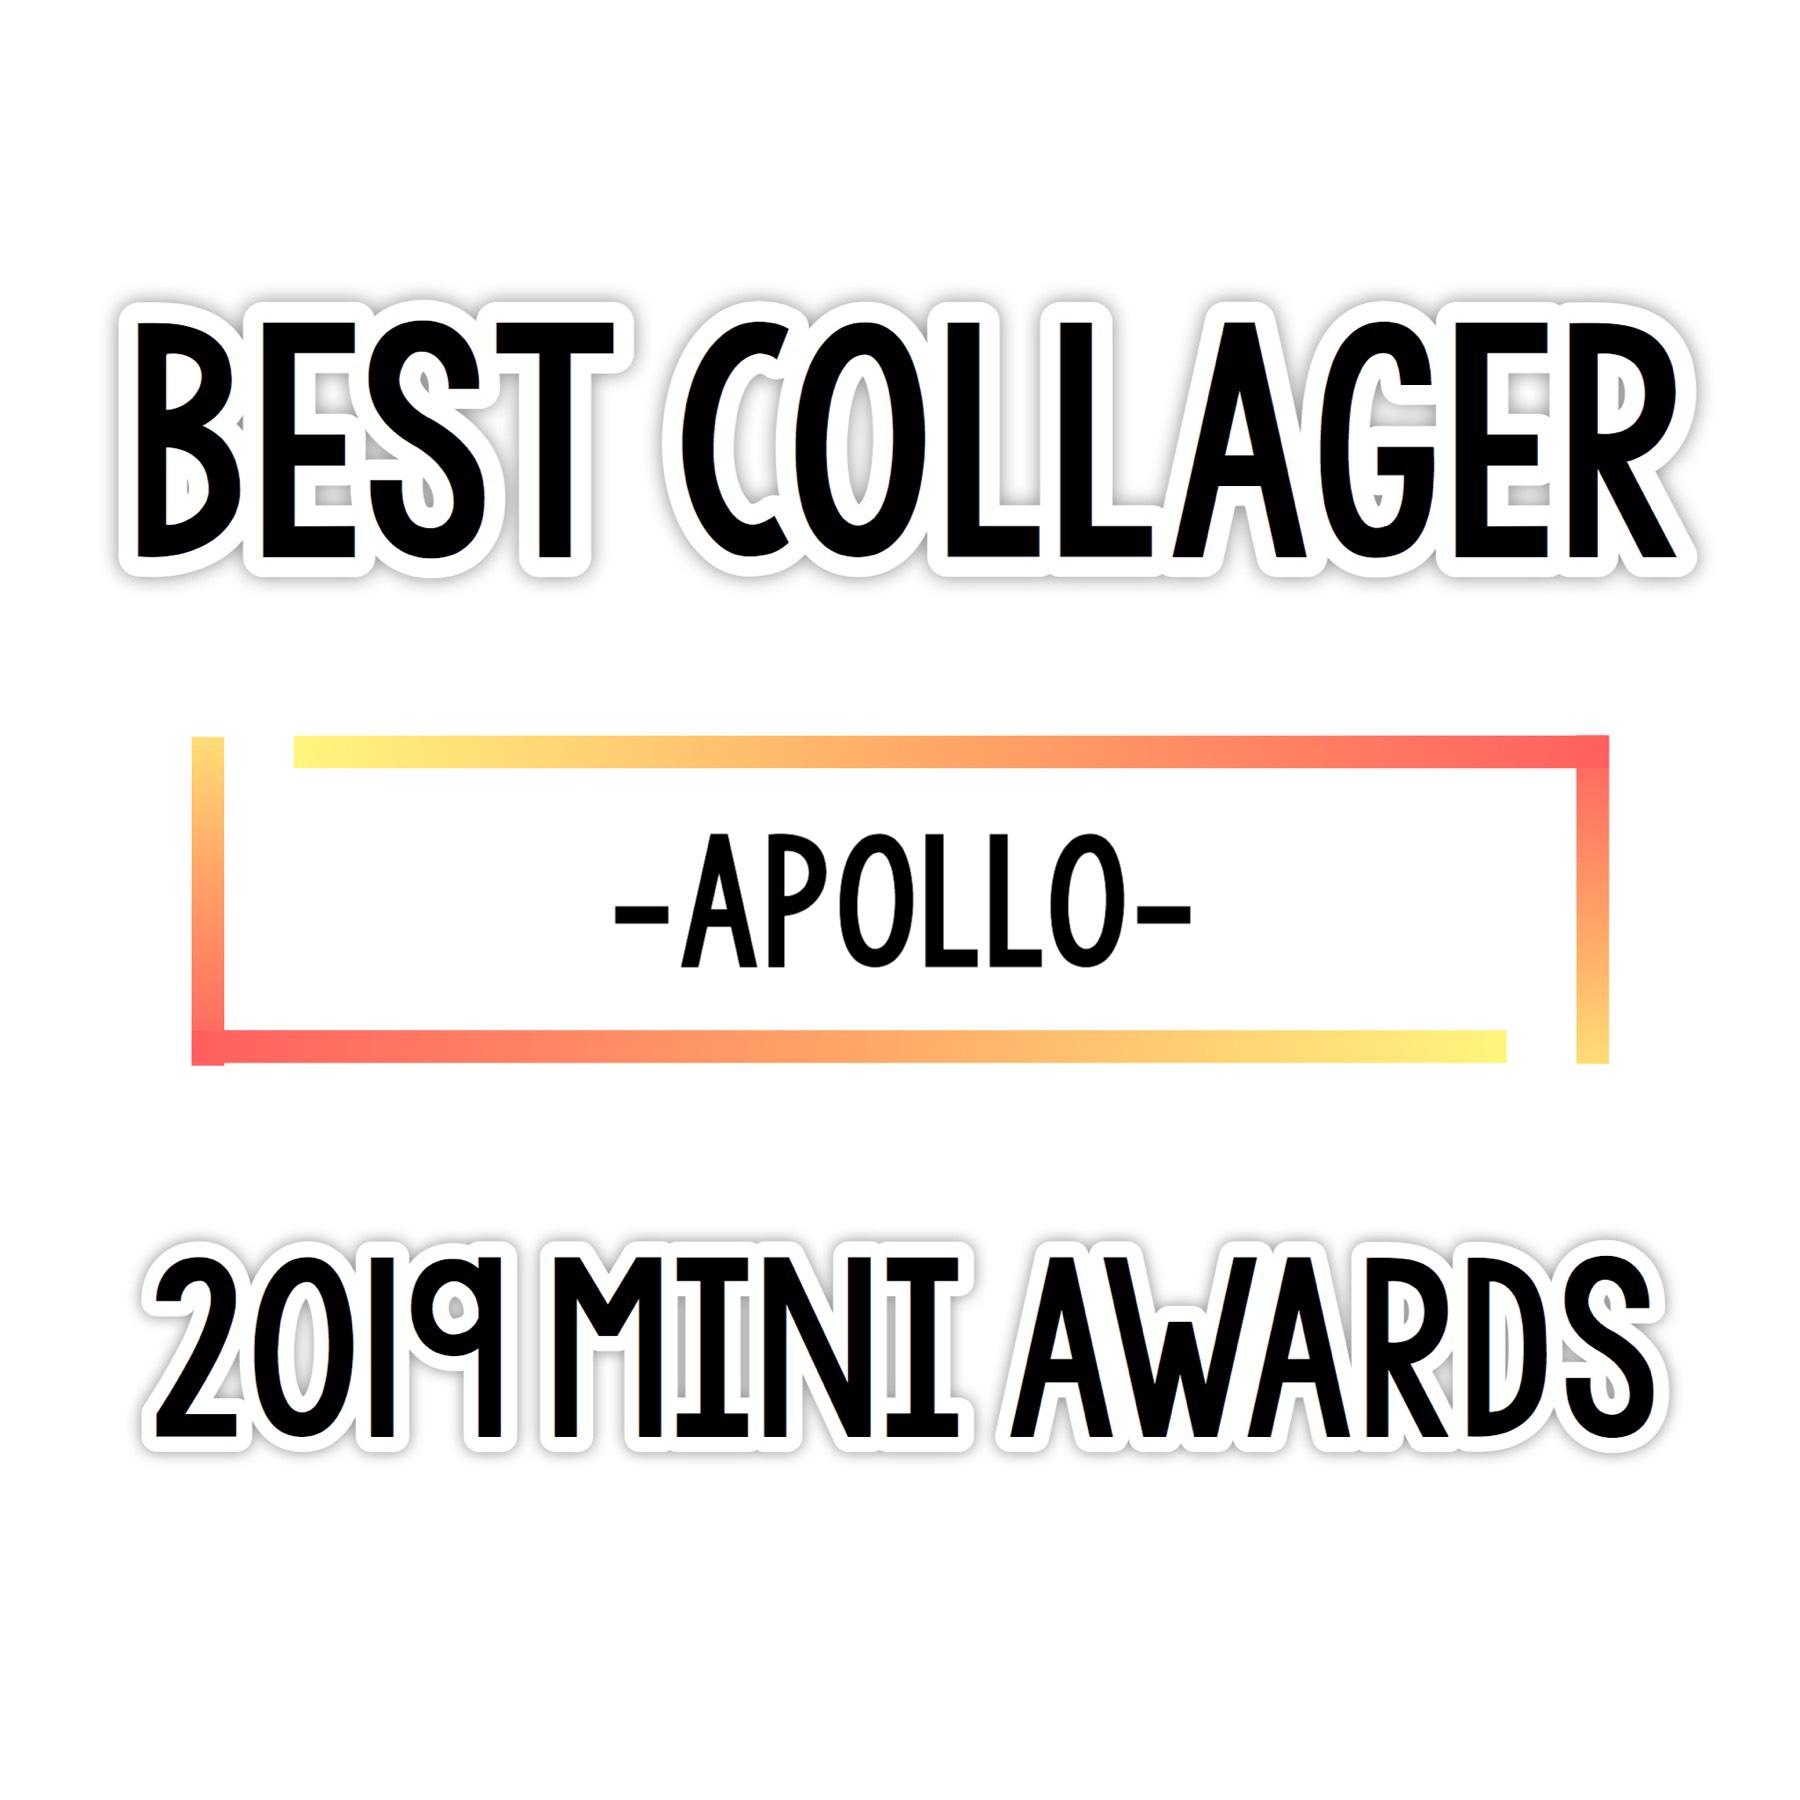 Congratulations -apollo- !